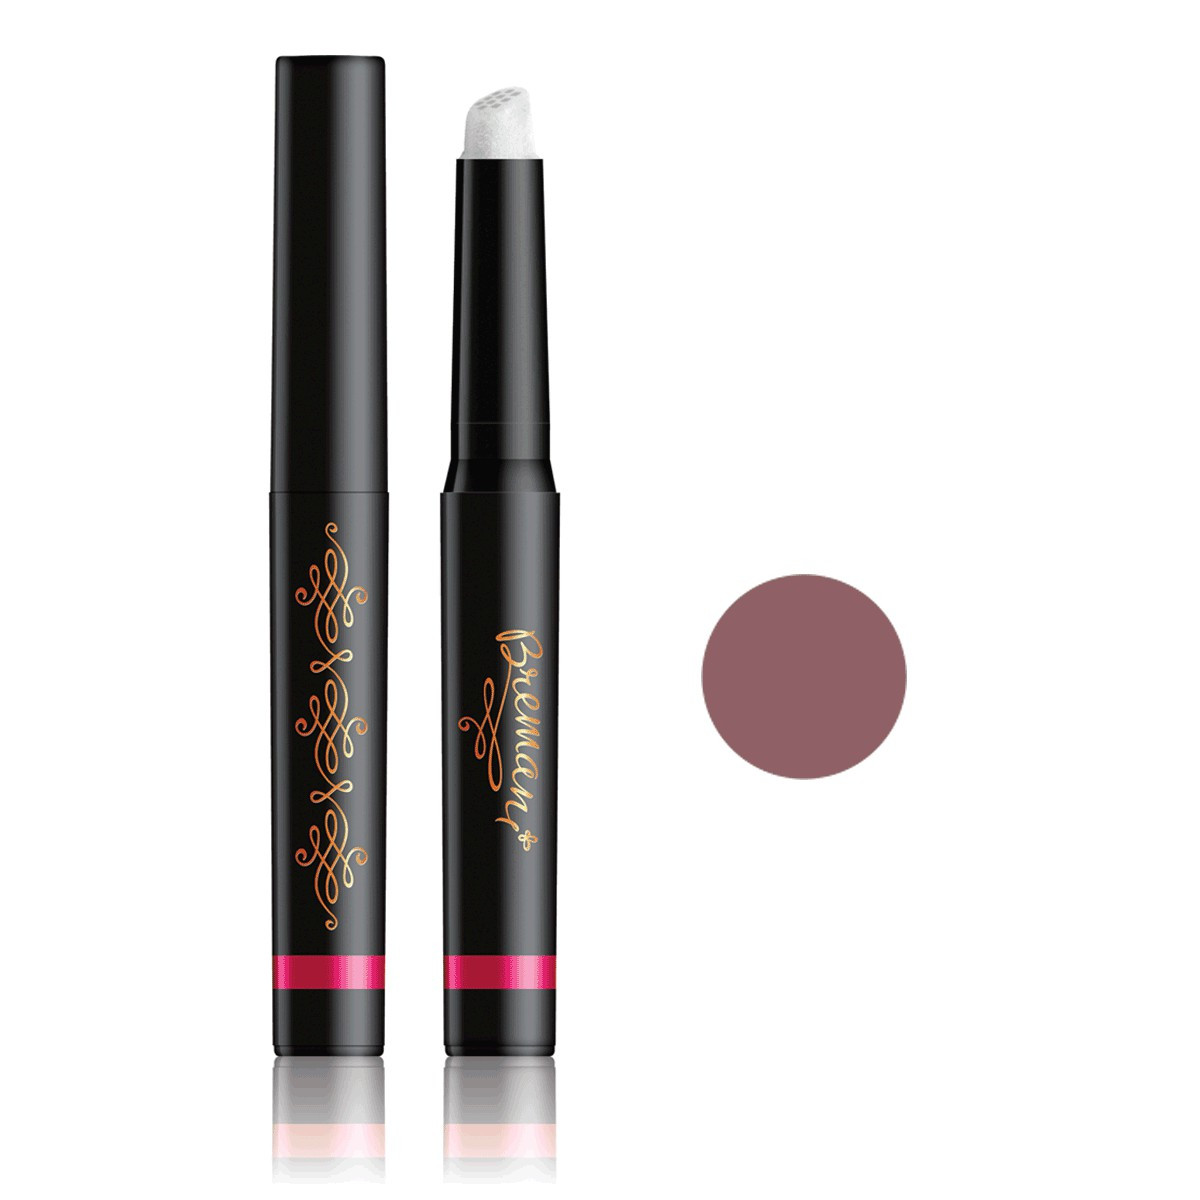 "New! Lipstick Caramel Новинка! Помада ""Карамель"" с фибровым аппликатором, Bremani, NSP, НСП, Италия."